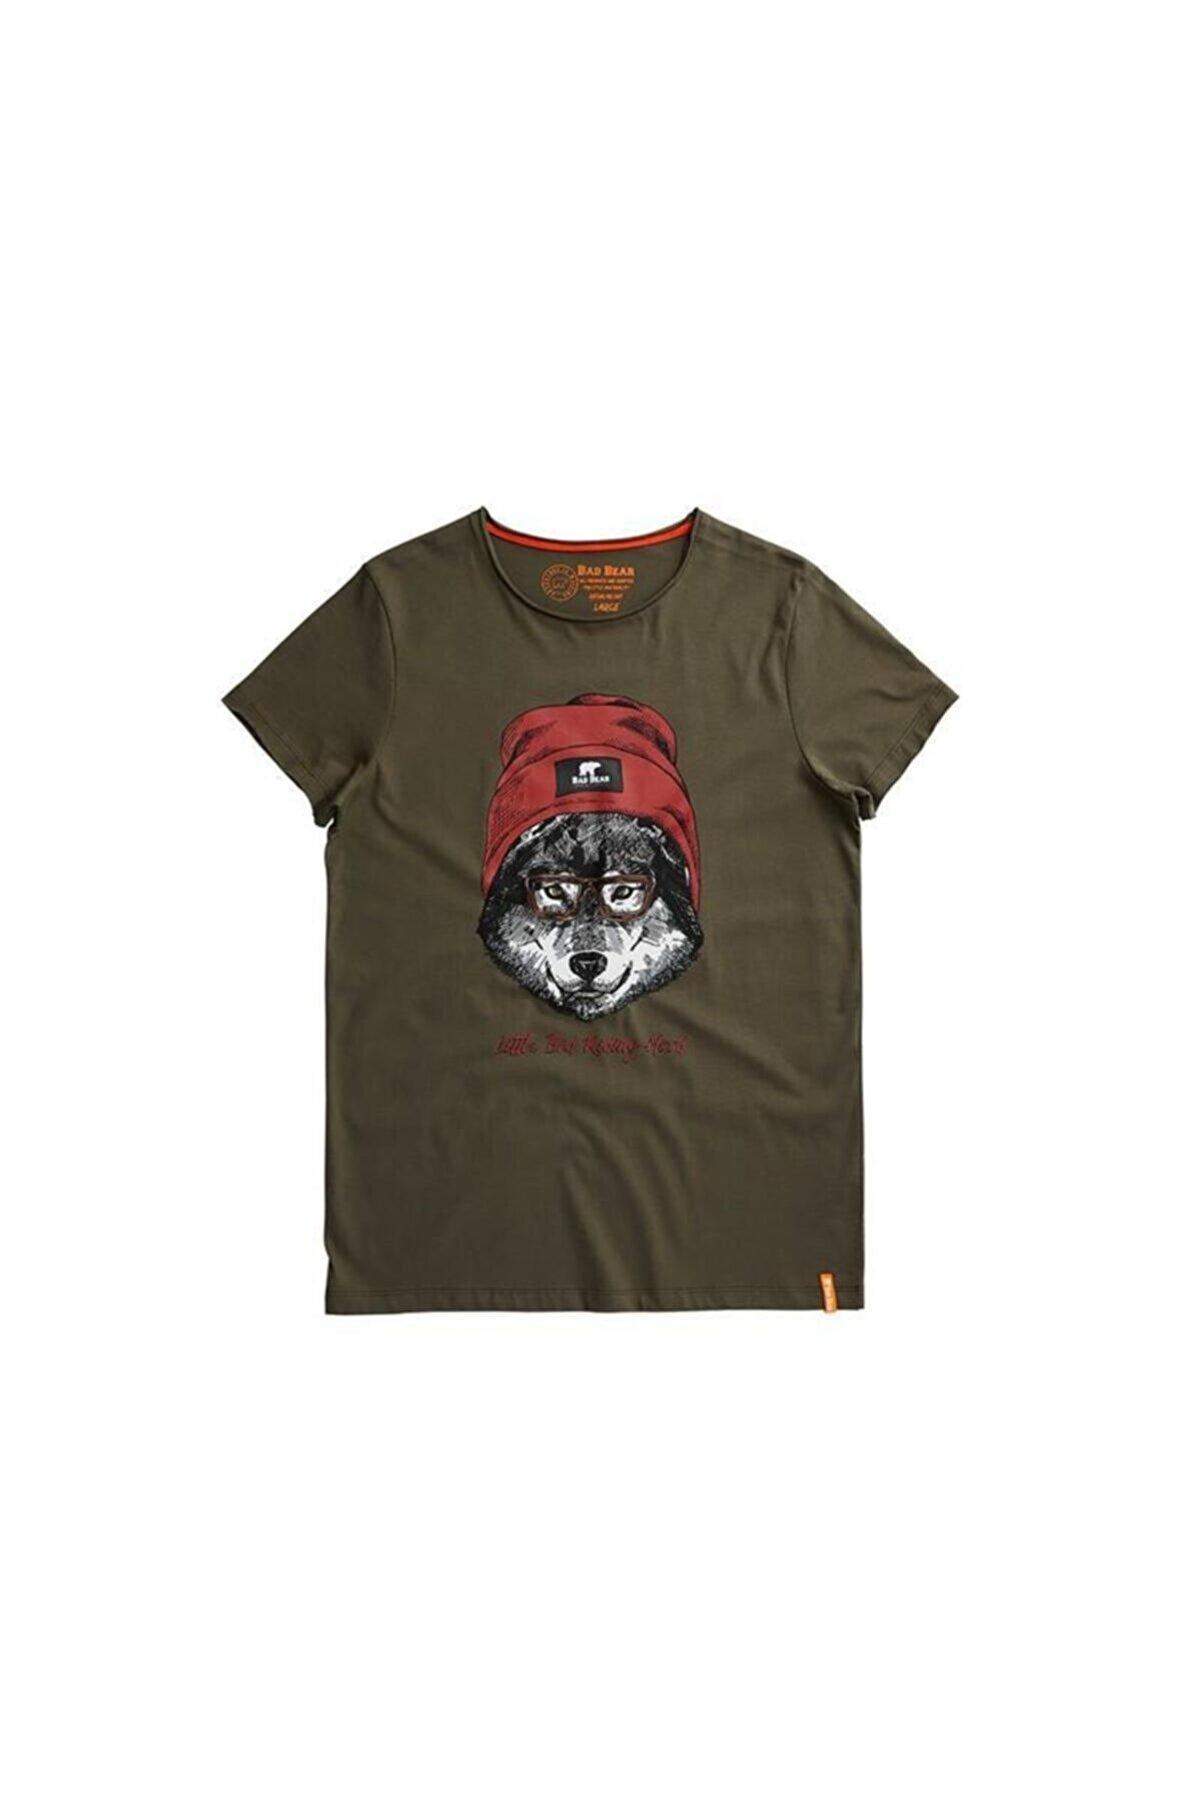 Bad Bear Haki Erkek Tişört RED HOOD TEE KHAKI